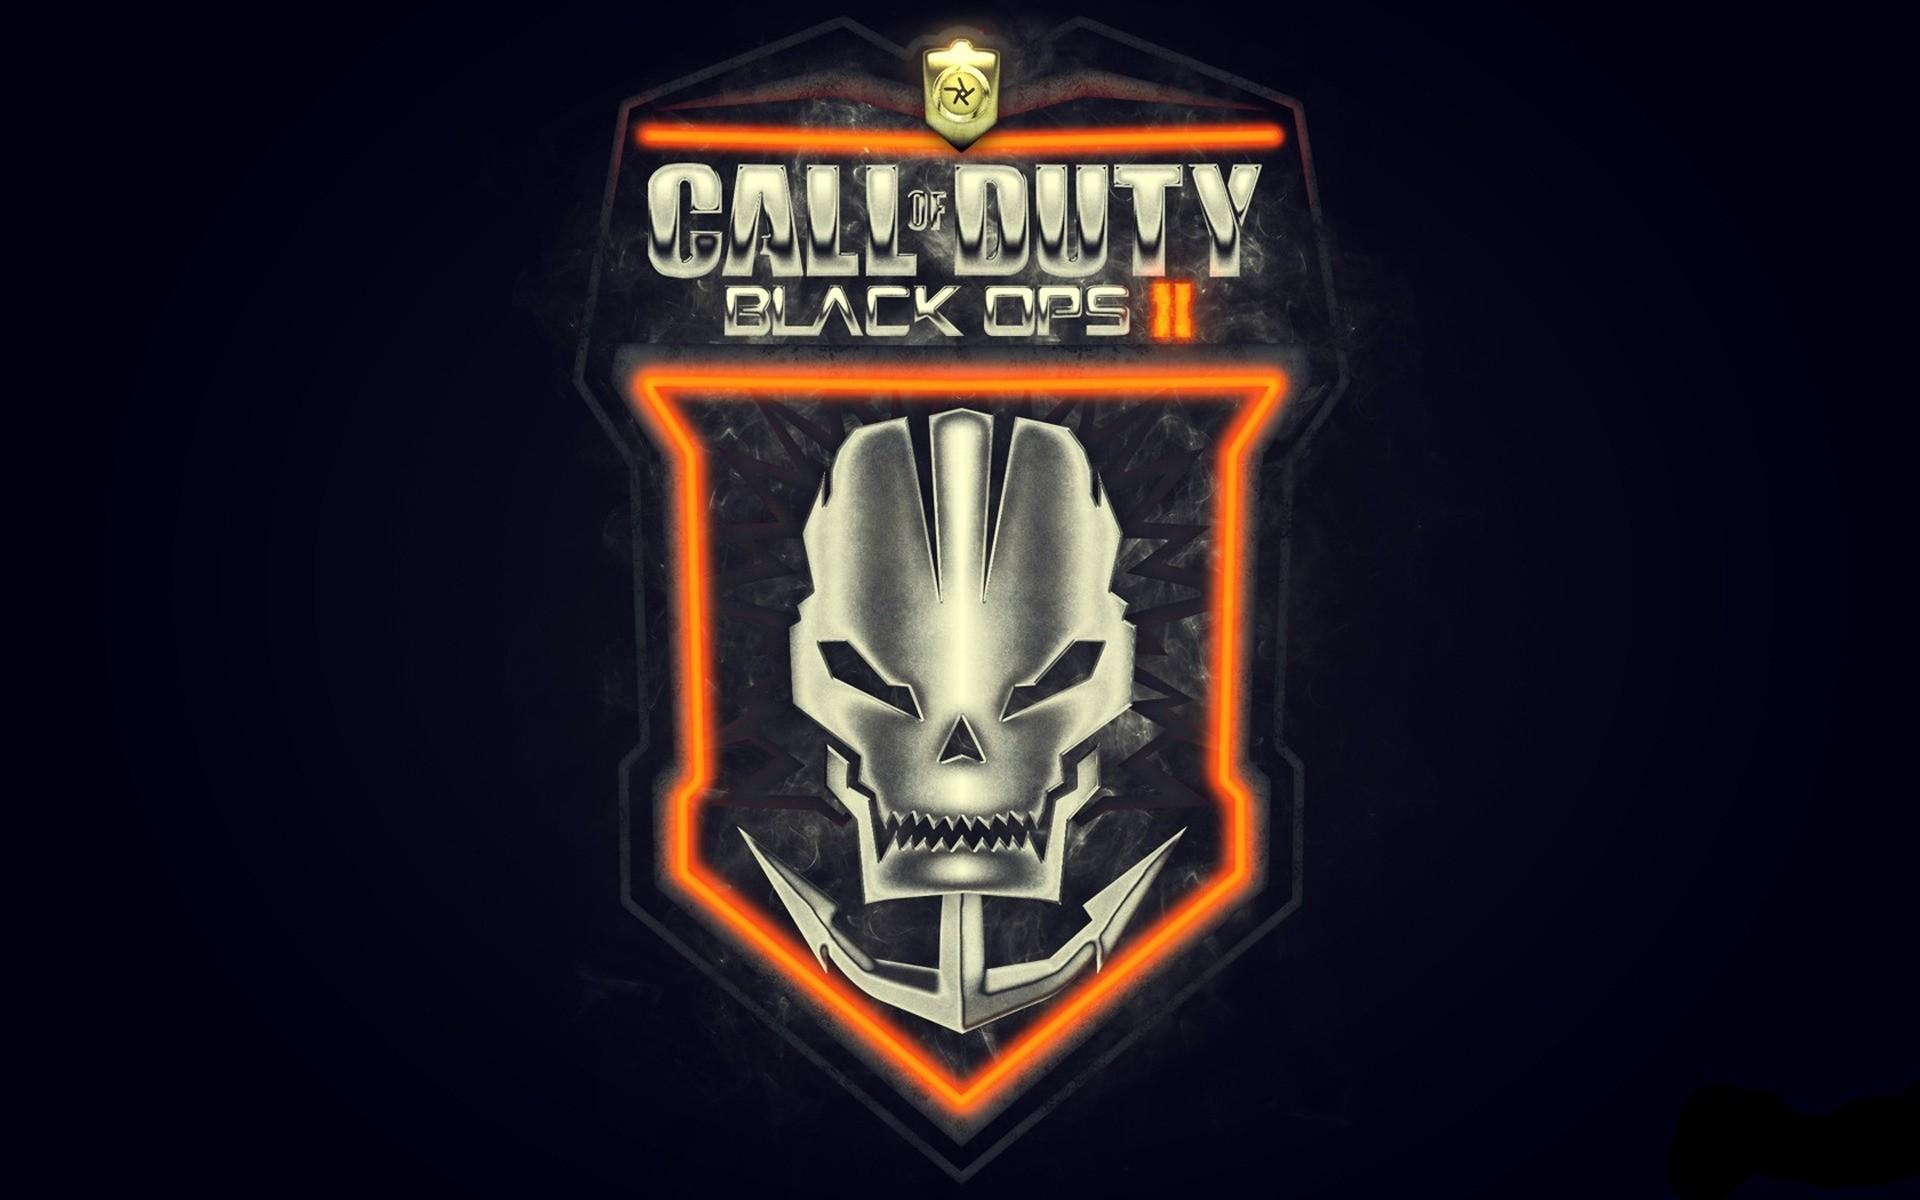 Call Of Duty Black Ops Ii Logo Phone Wallpapers